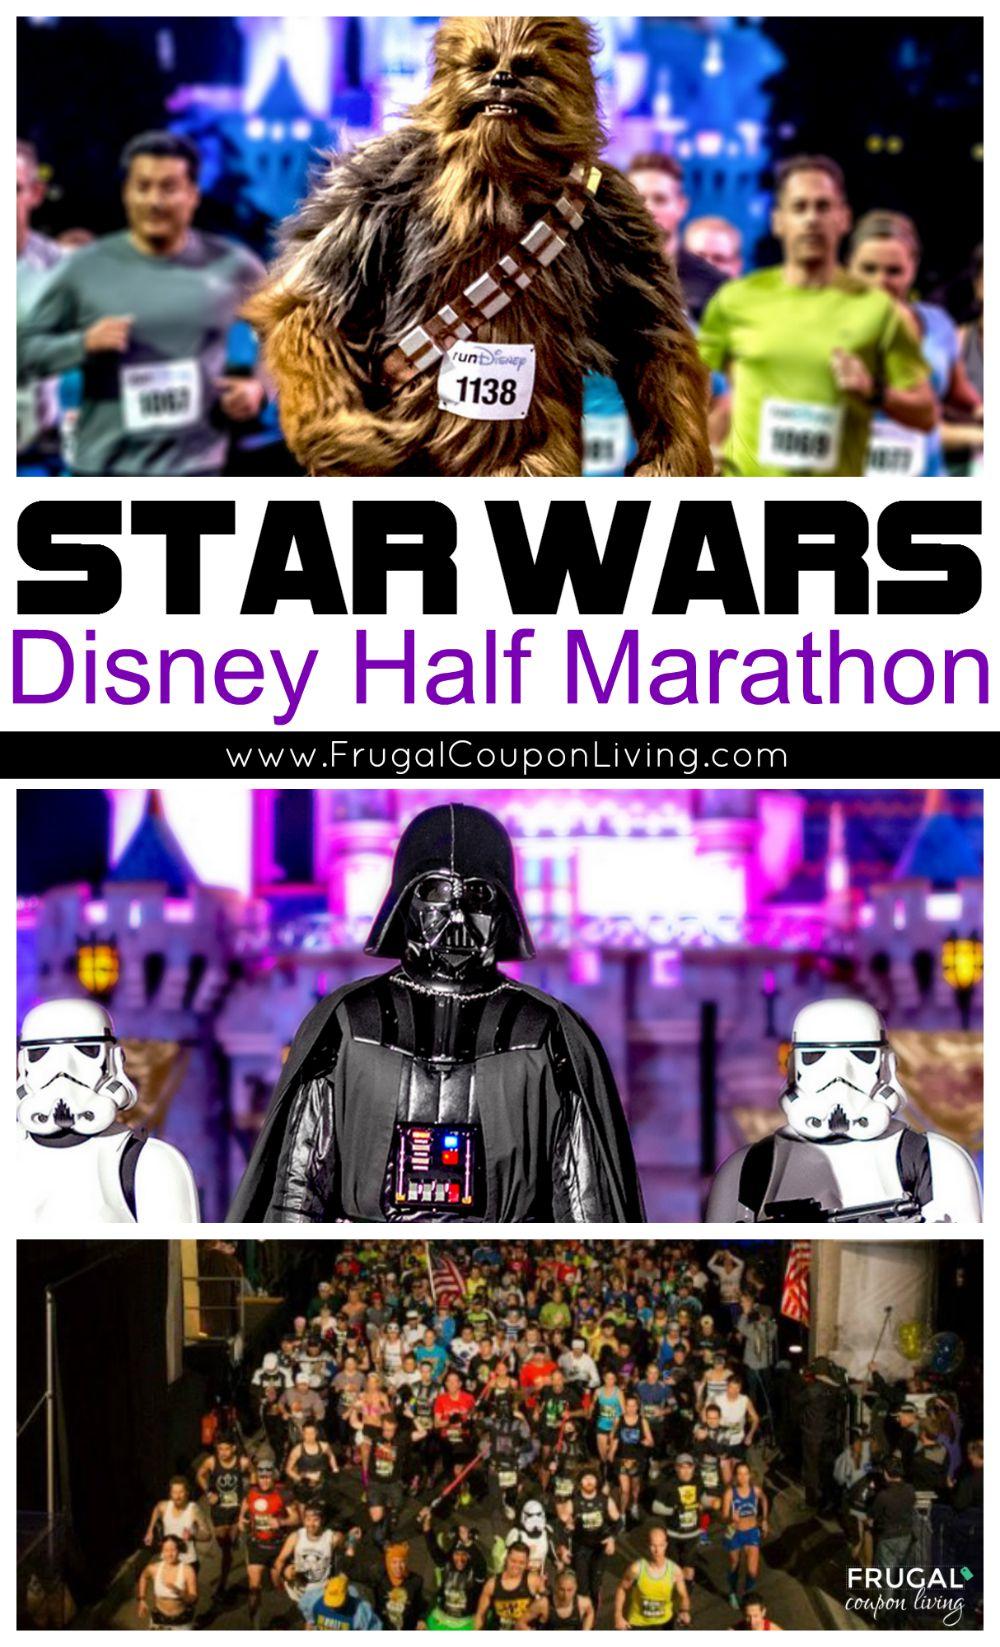 Disney Star Wars Half Marathon Frugal Coupon Living